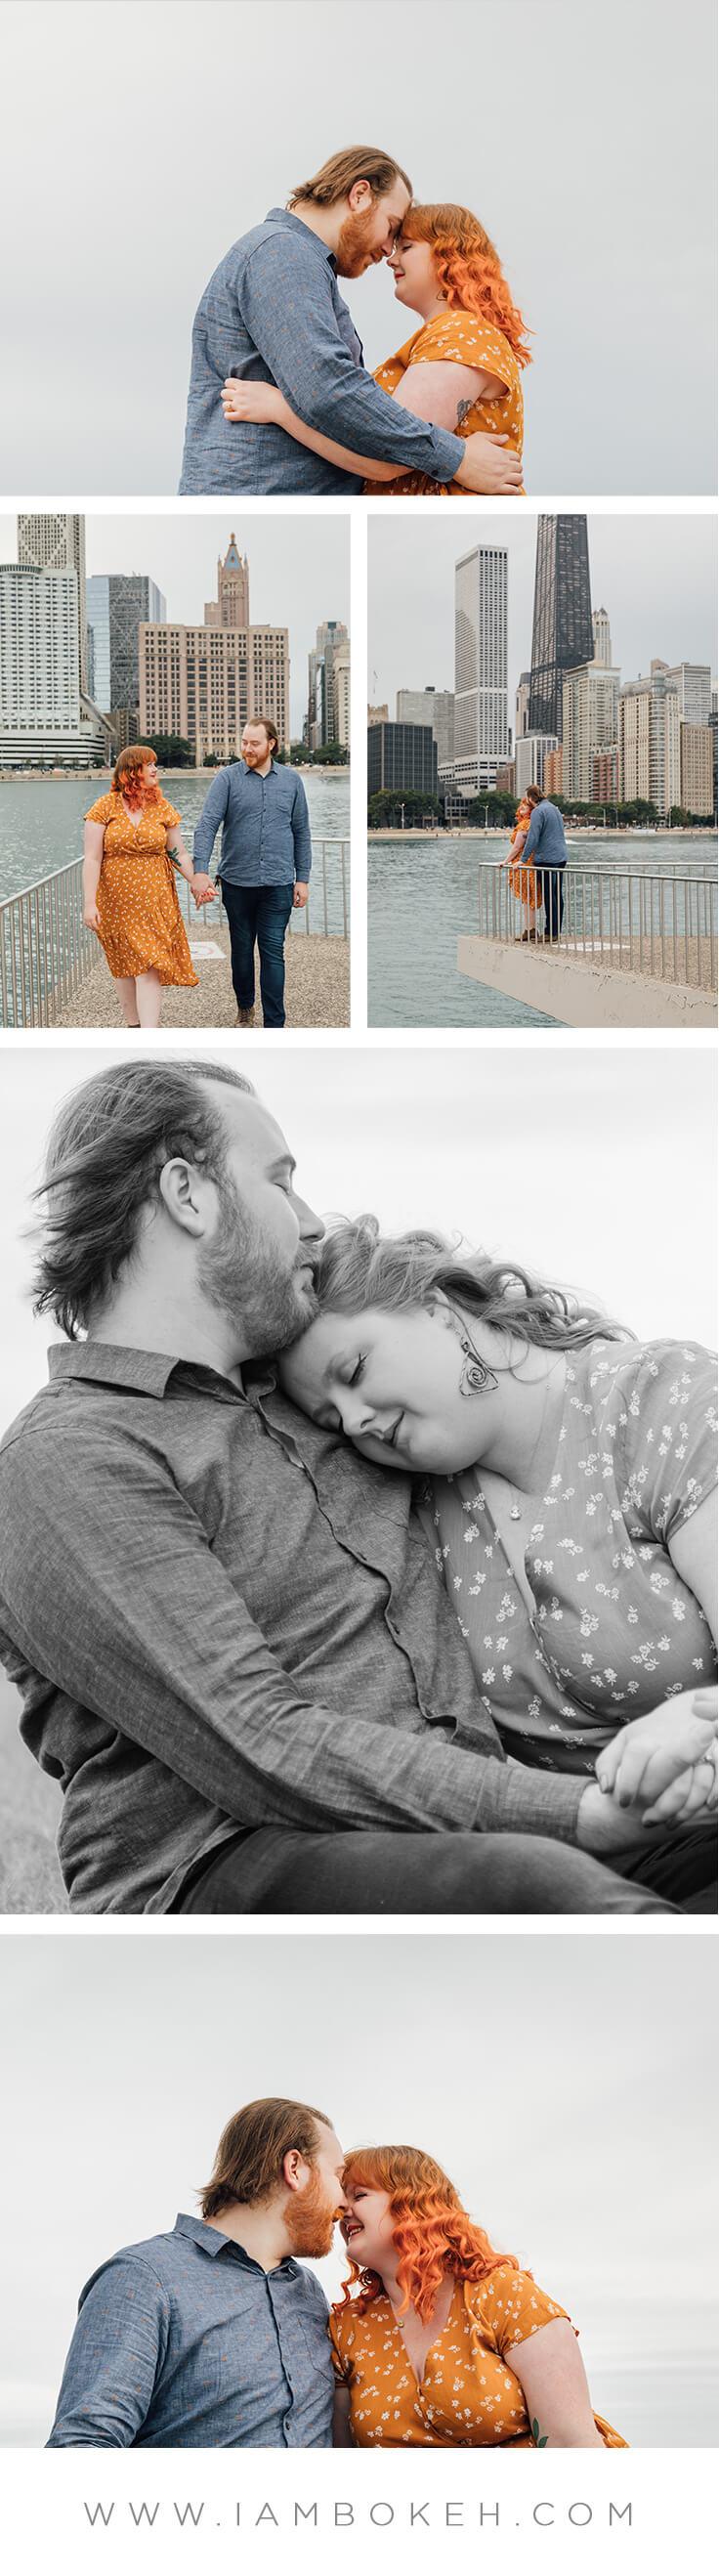 Bokéh Studios | Engagement Shoot in Chicago: Jason & Reanna